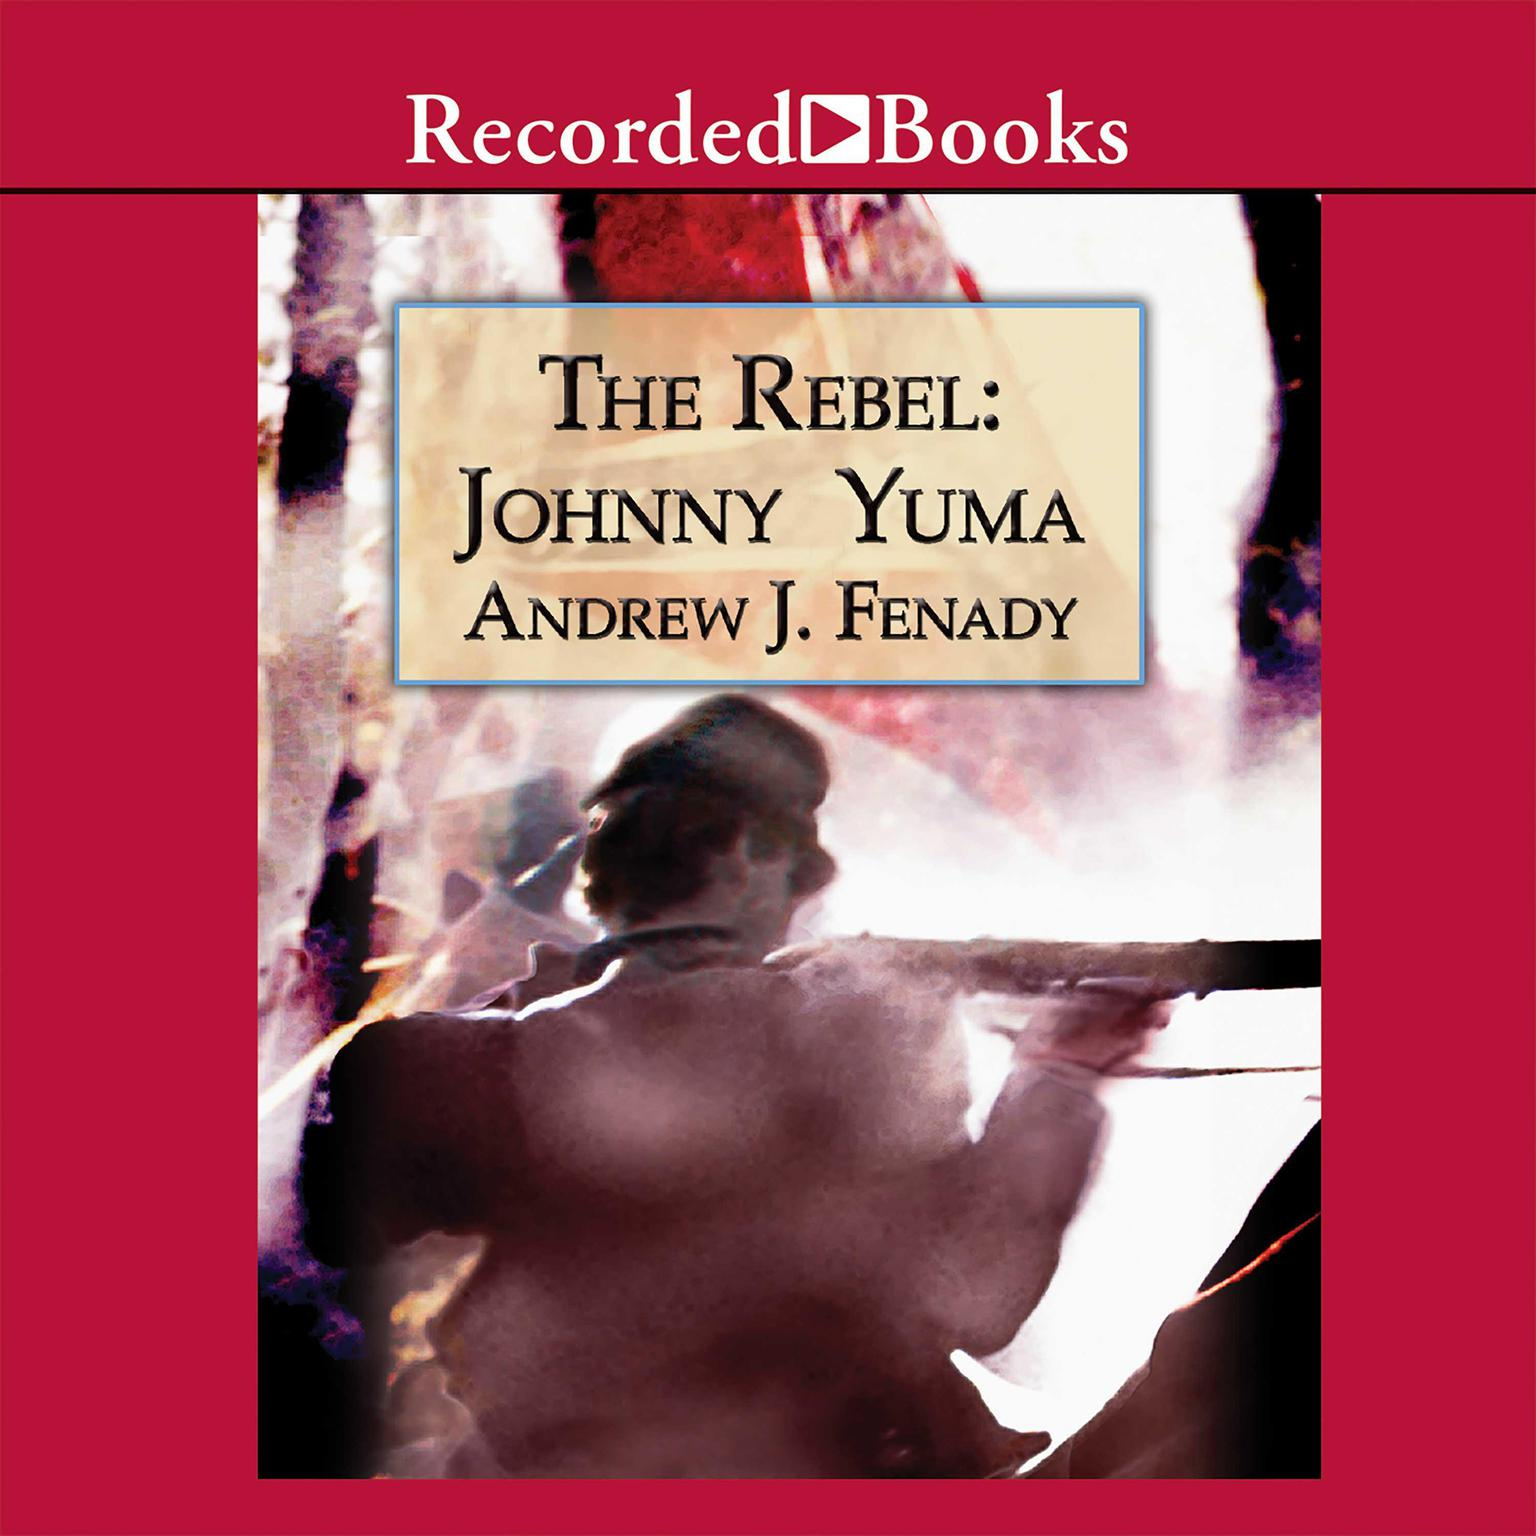 The Rebel: Johnny Yuma Audiobook, by Andrew J. Fenady